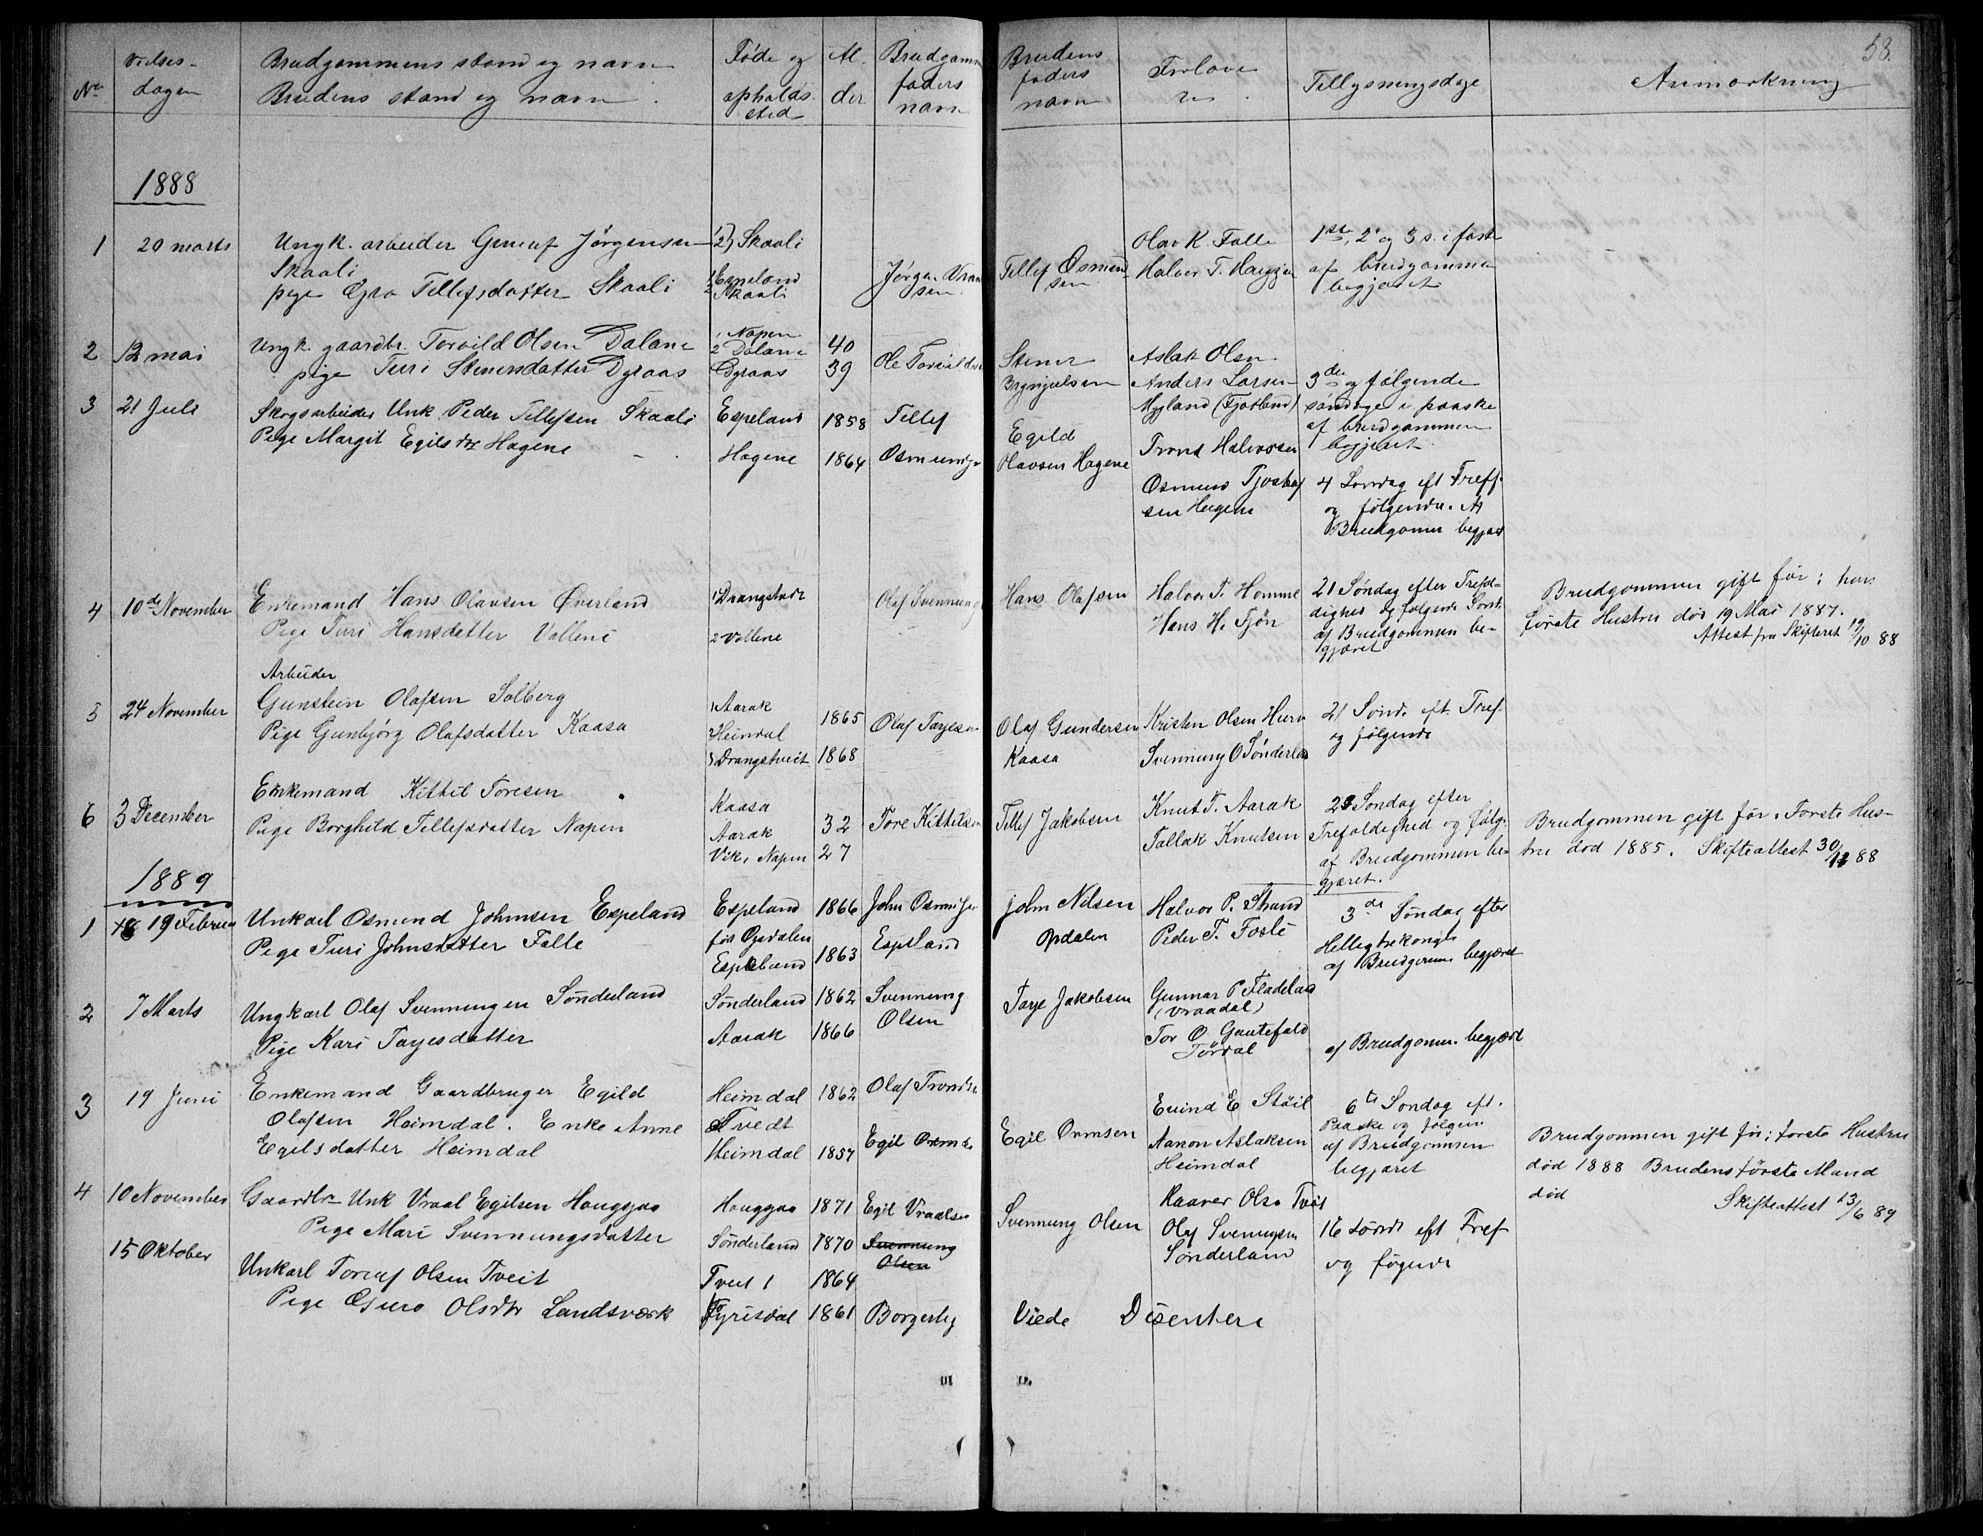 SAKO, Nissedal kirkebøker, G/Gb/L0002: Klokkerbok nr. II 2, 1863-1892, s. 58